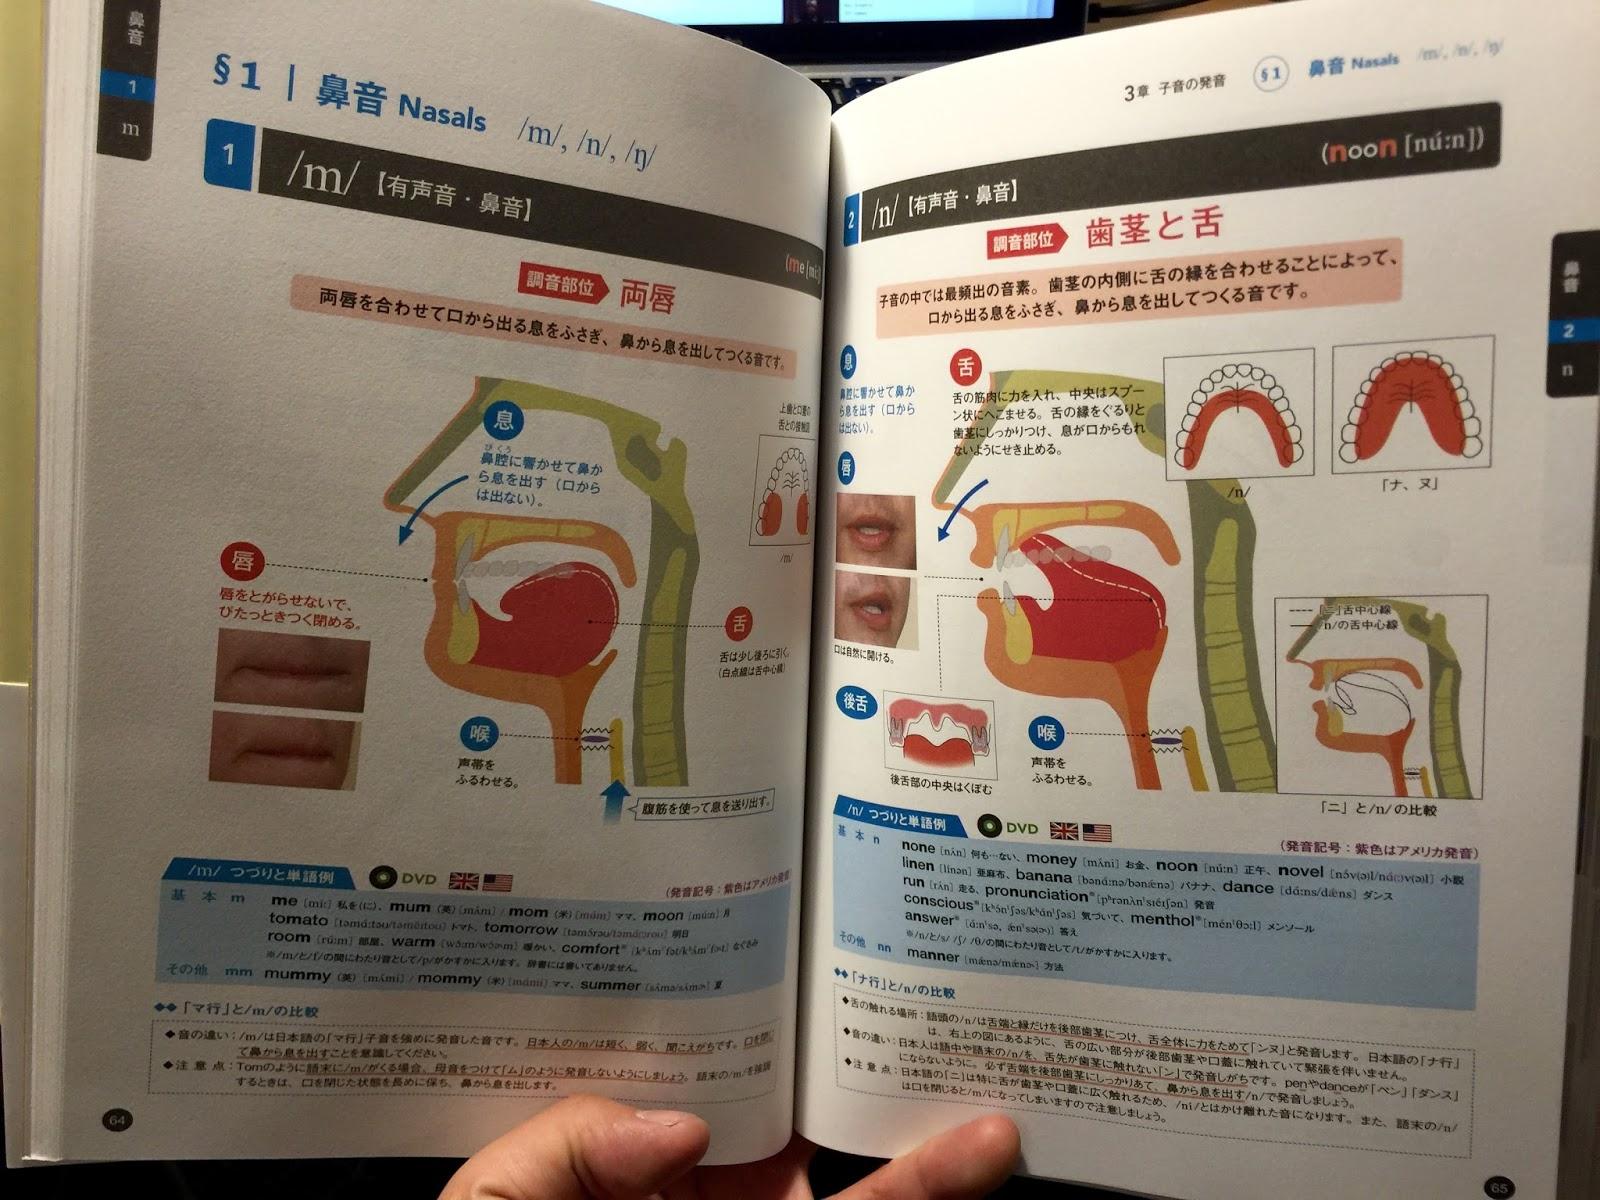 Ippei's Room一平の部屋: English pronunciation correction!